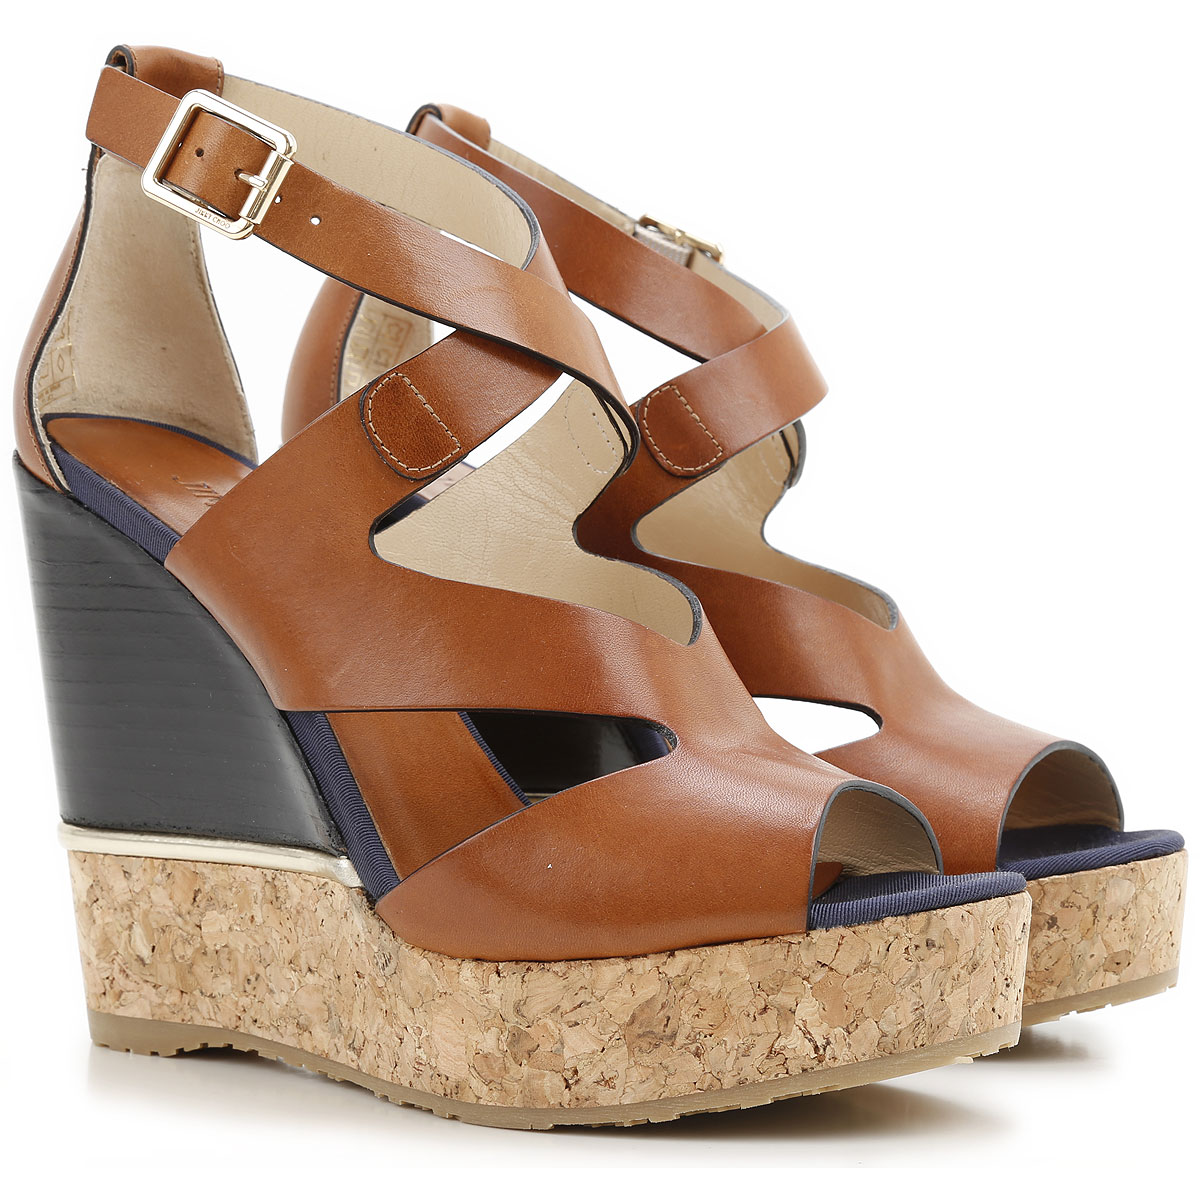 chaussures femme jimmy choo code produit nate 120 vac. Black Bedroom Furniture Sets. Home Design Ideas